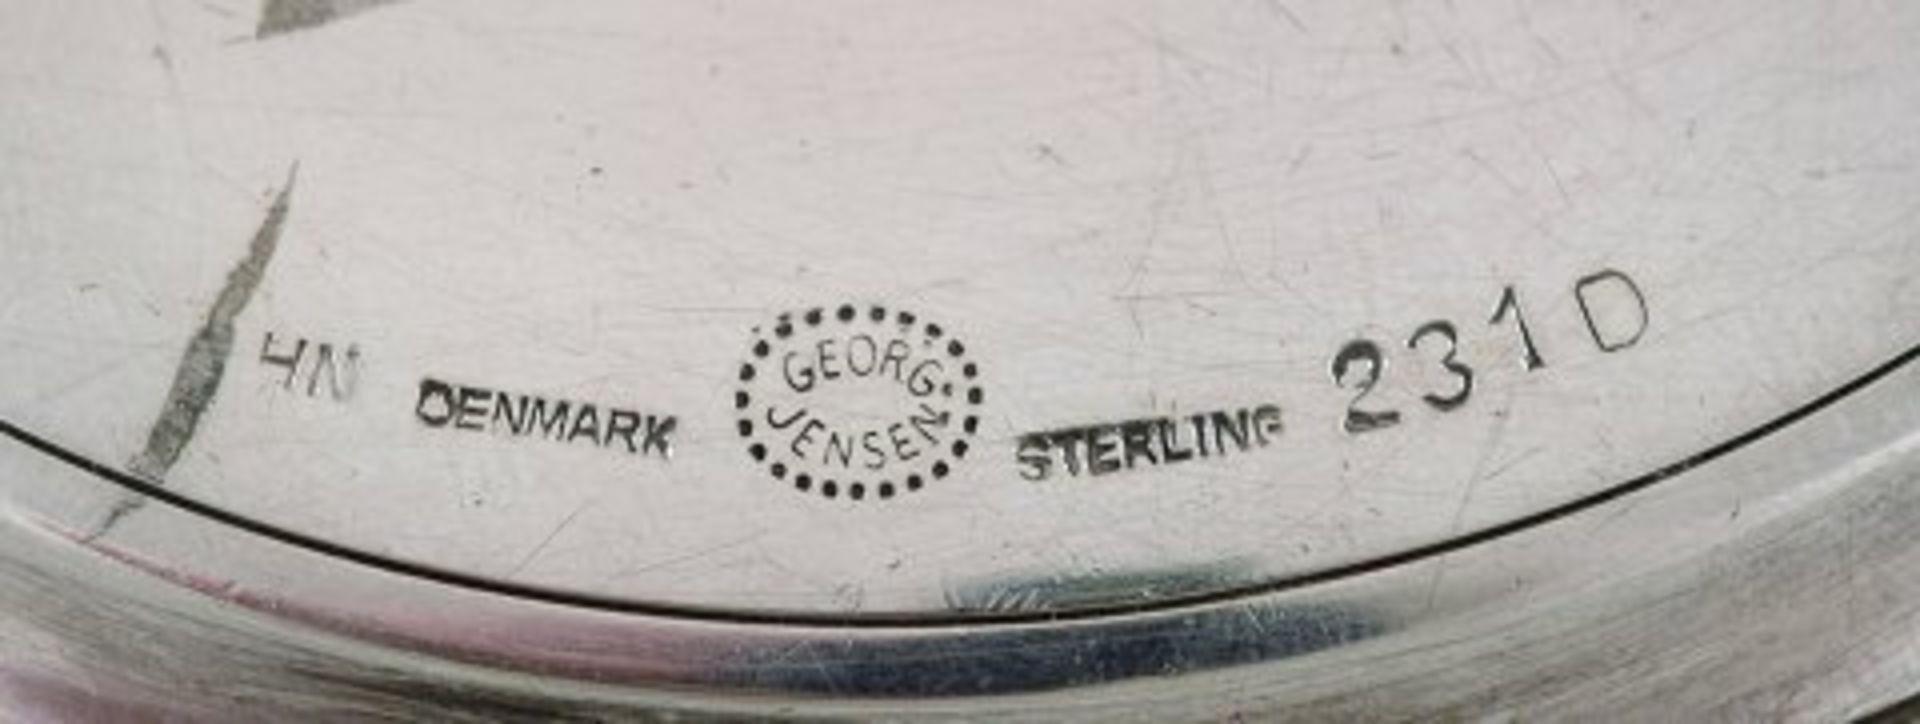 Harald Nielsen for Georg Jensen. Art deco Puderdose. Silber. Ca. 10cm. . - Image 3 of 3